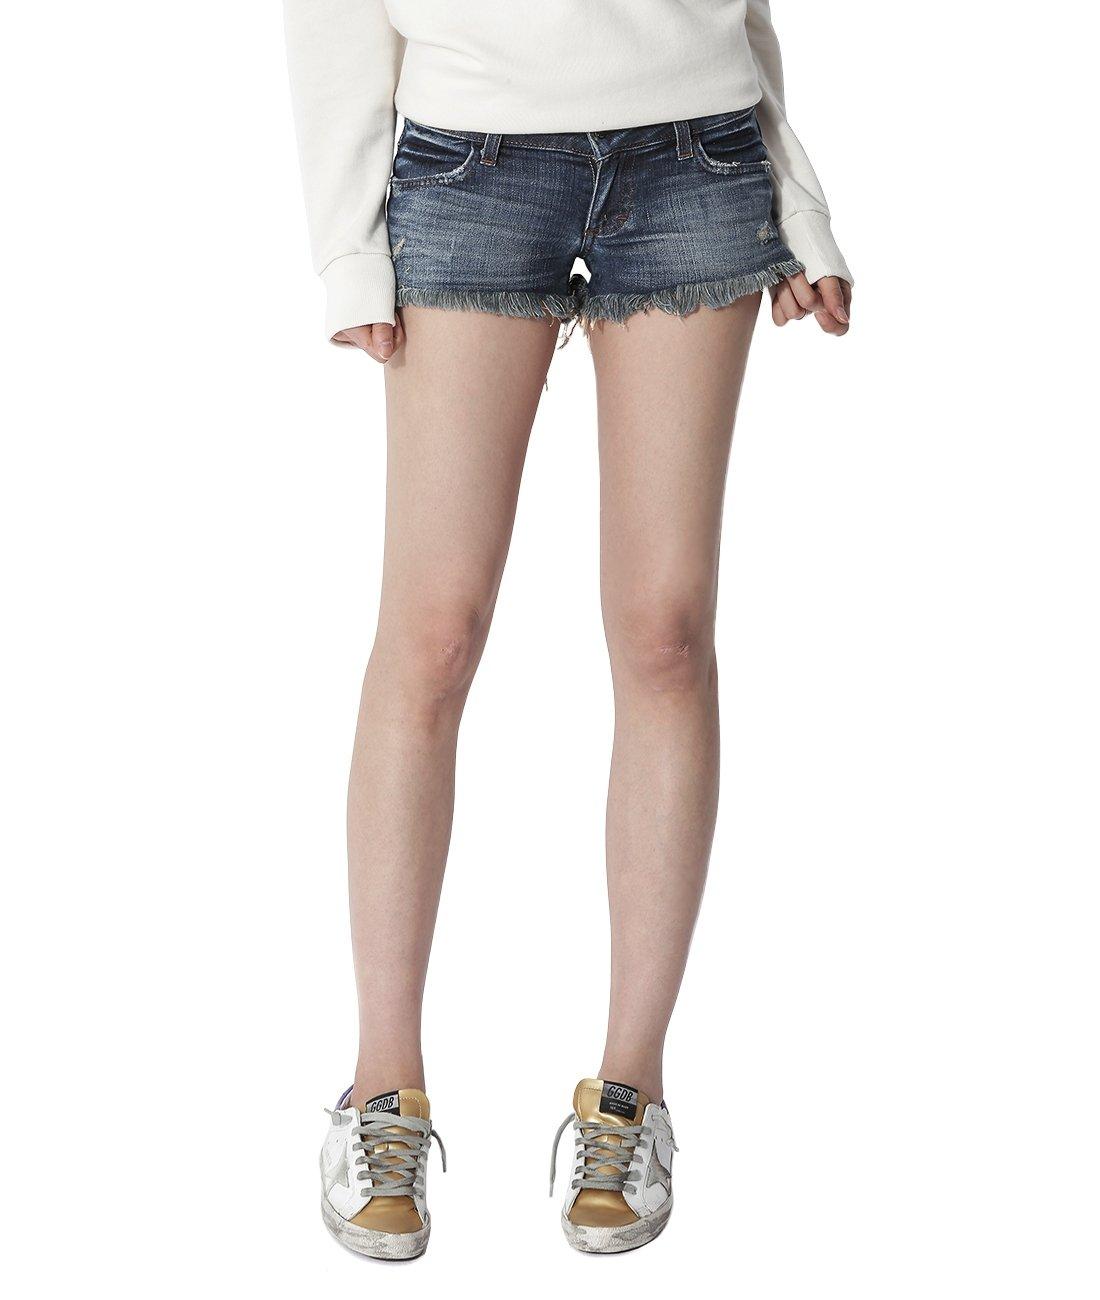 Wiberlux Siwy Women's Vintage Frayed Hem Denim Shorts 26 Blue